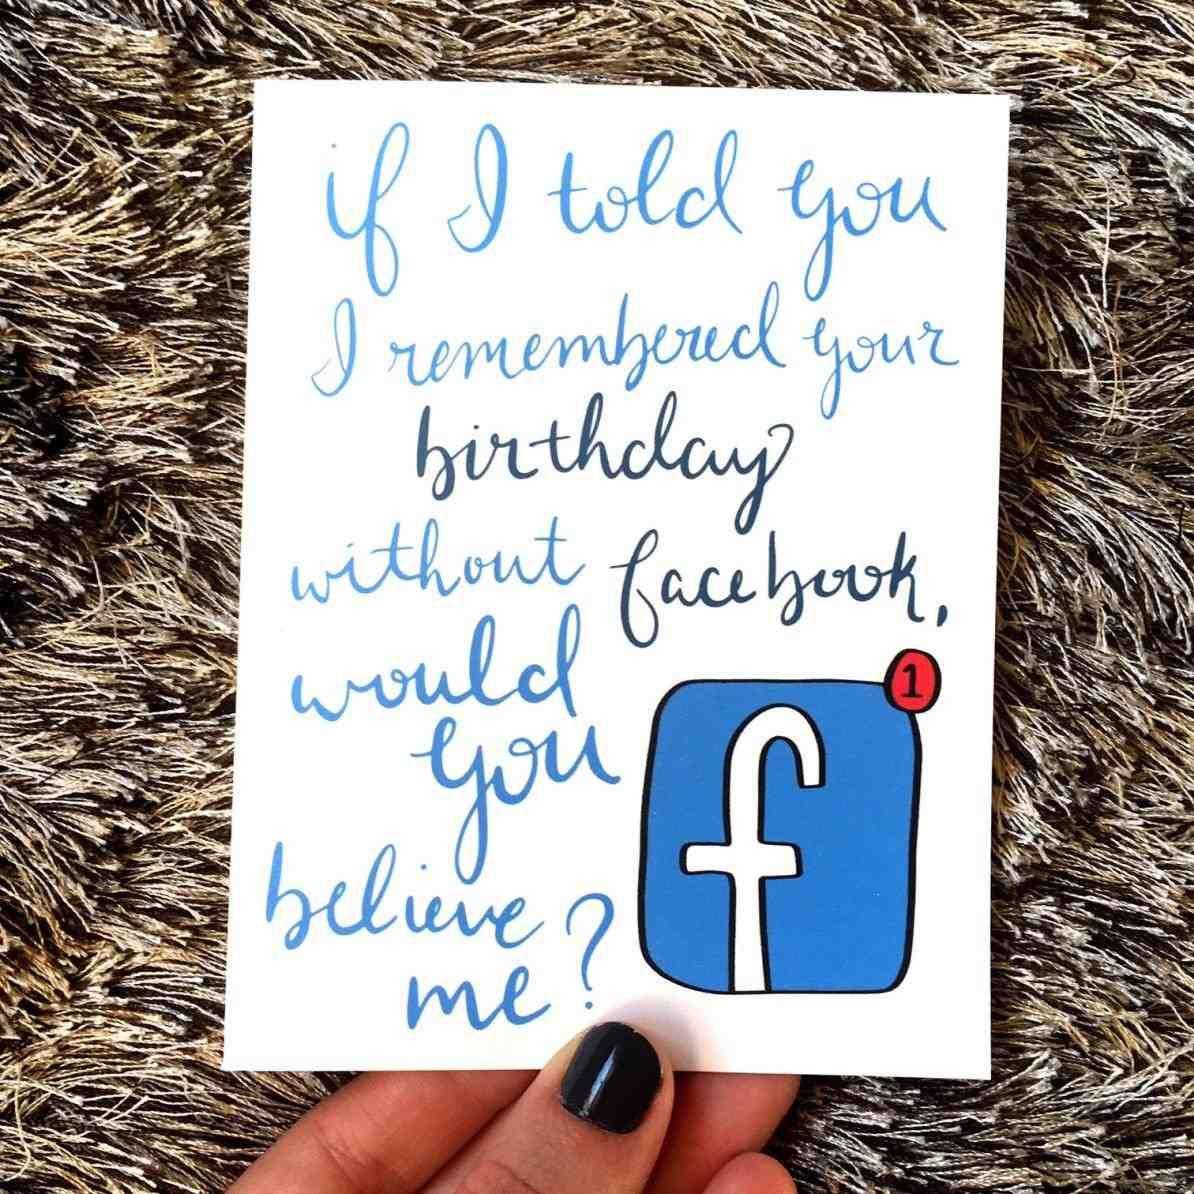 Facebook Vs Letterpressed Birthday Card Amazing Free Birthday Cards